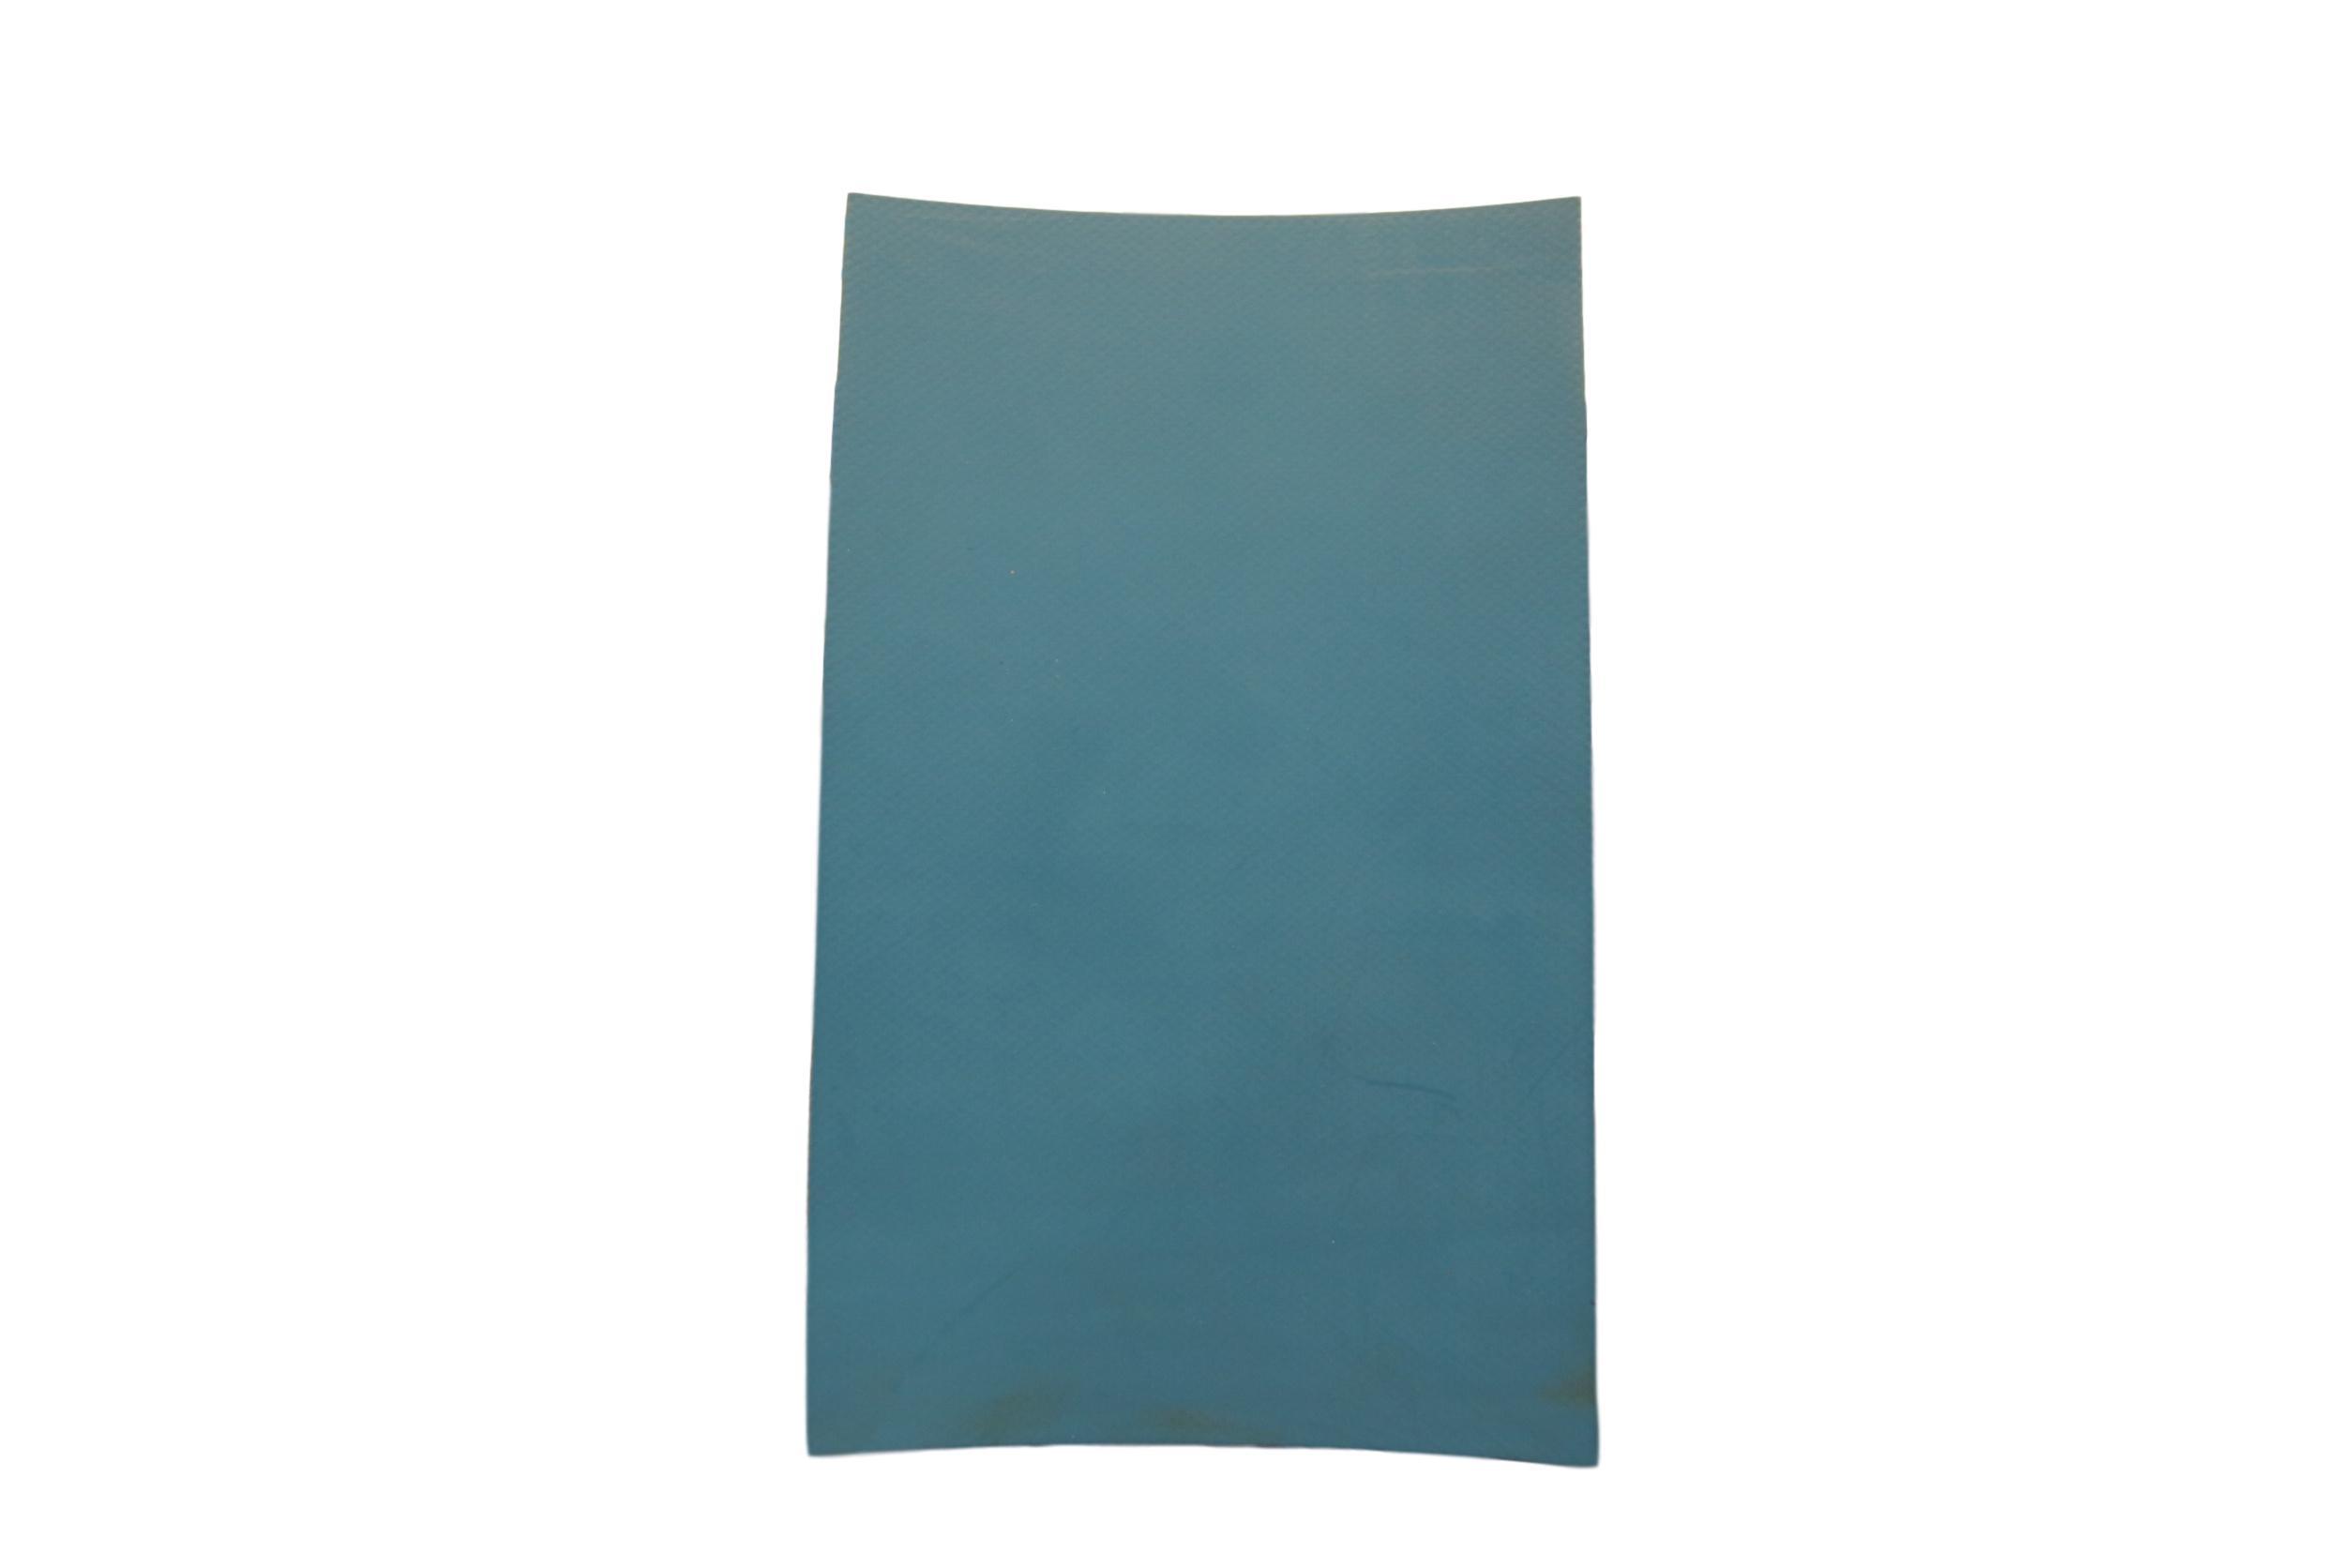 Conveyor Belting Blue PU 2 PLY Fabric Back 1.5mm